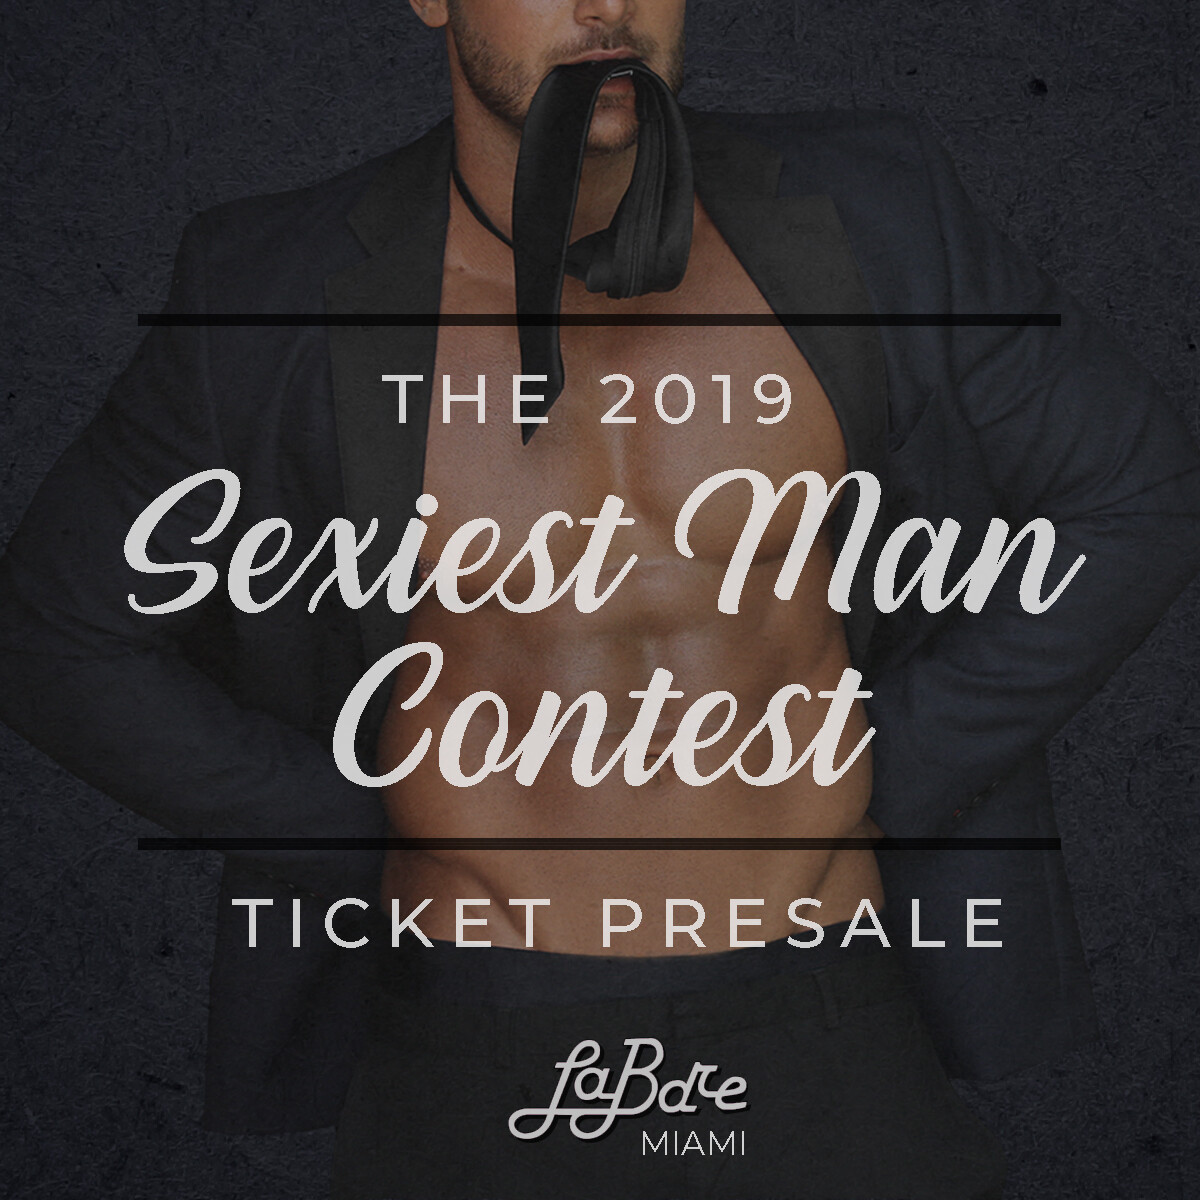 2019 Sexiest Man Contest Presale Ticket